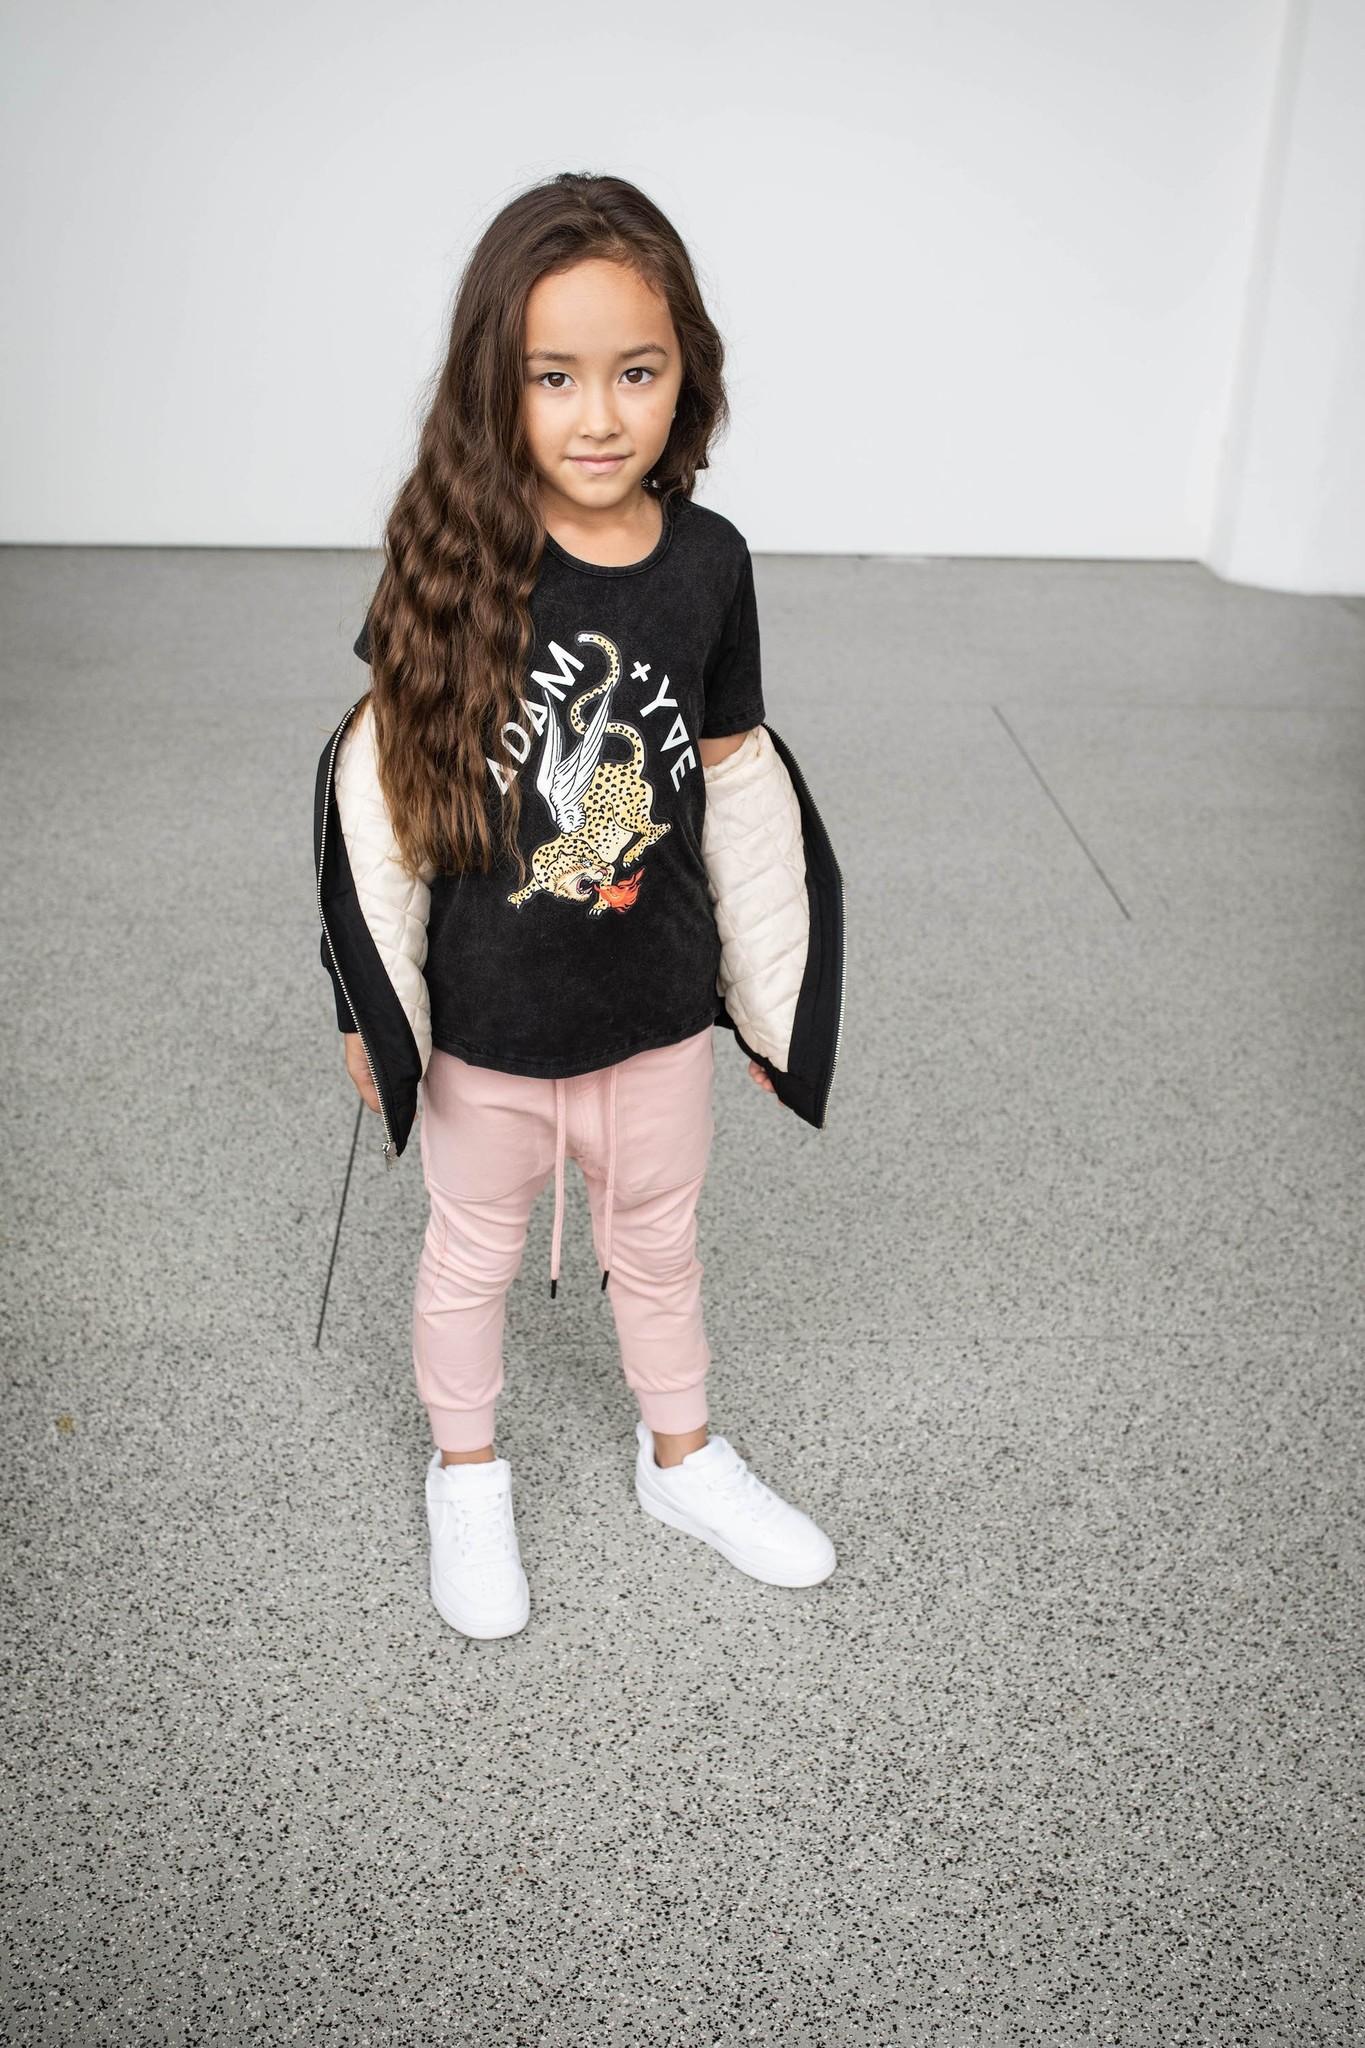 Adam + Yve EXTRA LONG T-SHIRT   COOL LEOPARD SHIRT   CHILDREN'S CLOTHING